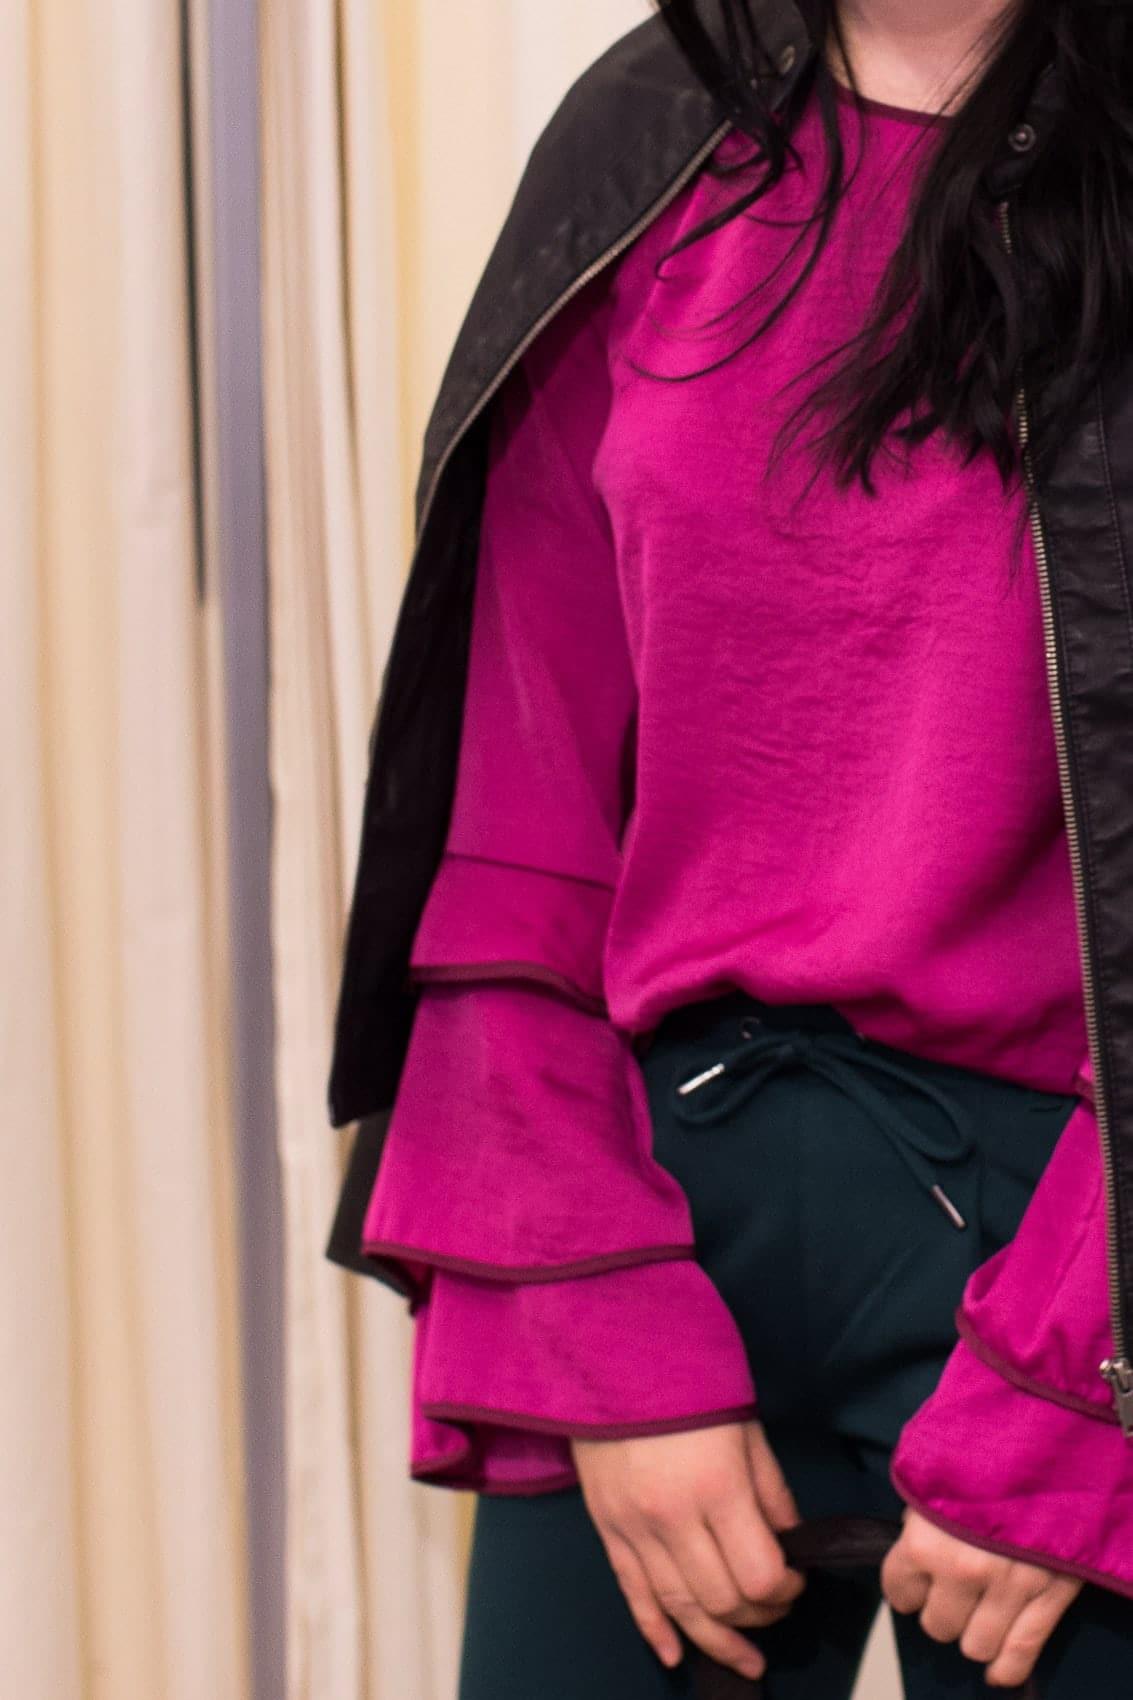 Frühling & Sommer Trends 2018 bei Globus: Meine Style-Beratung